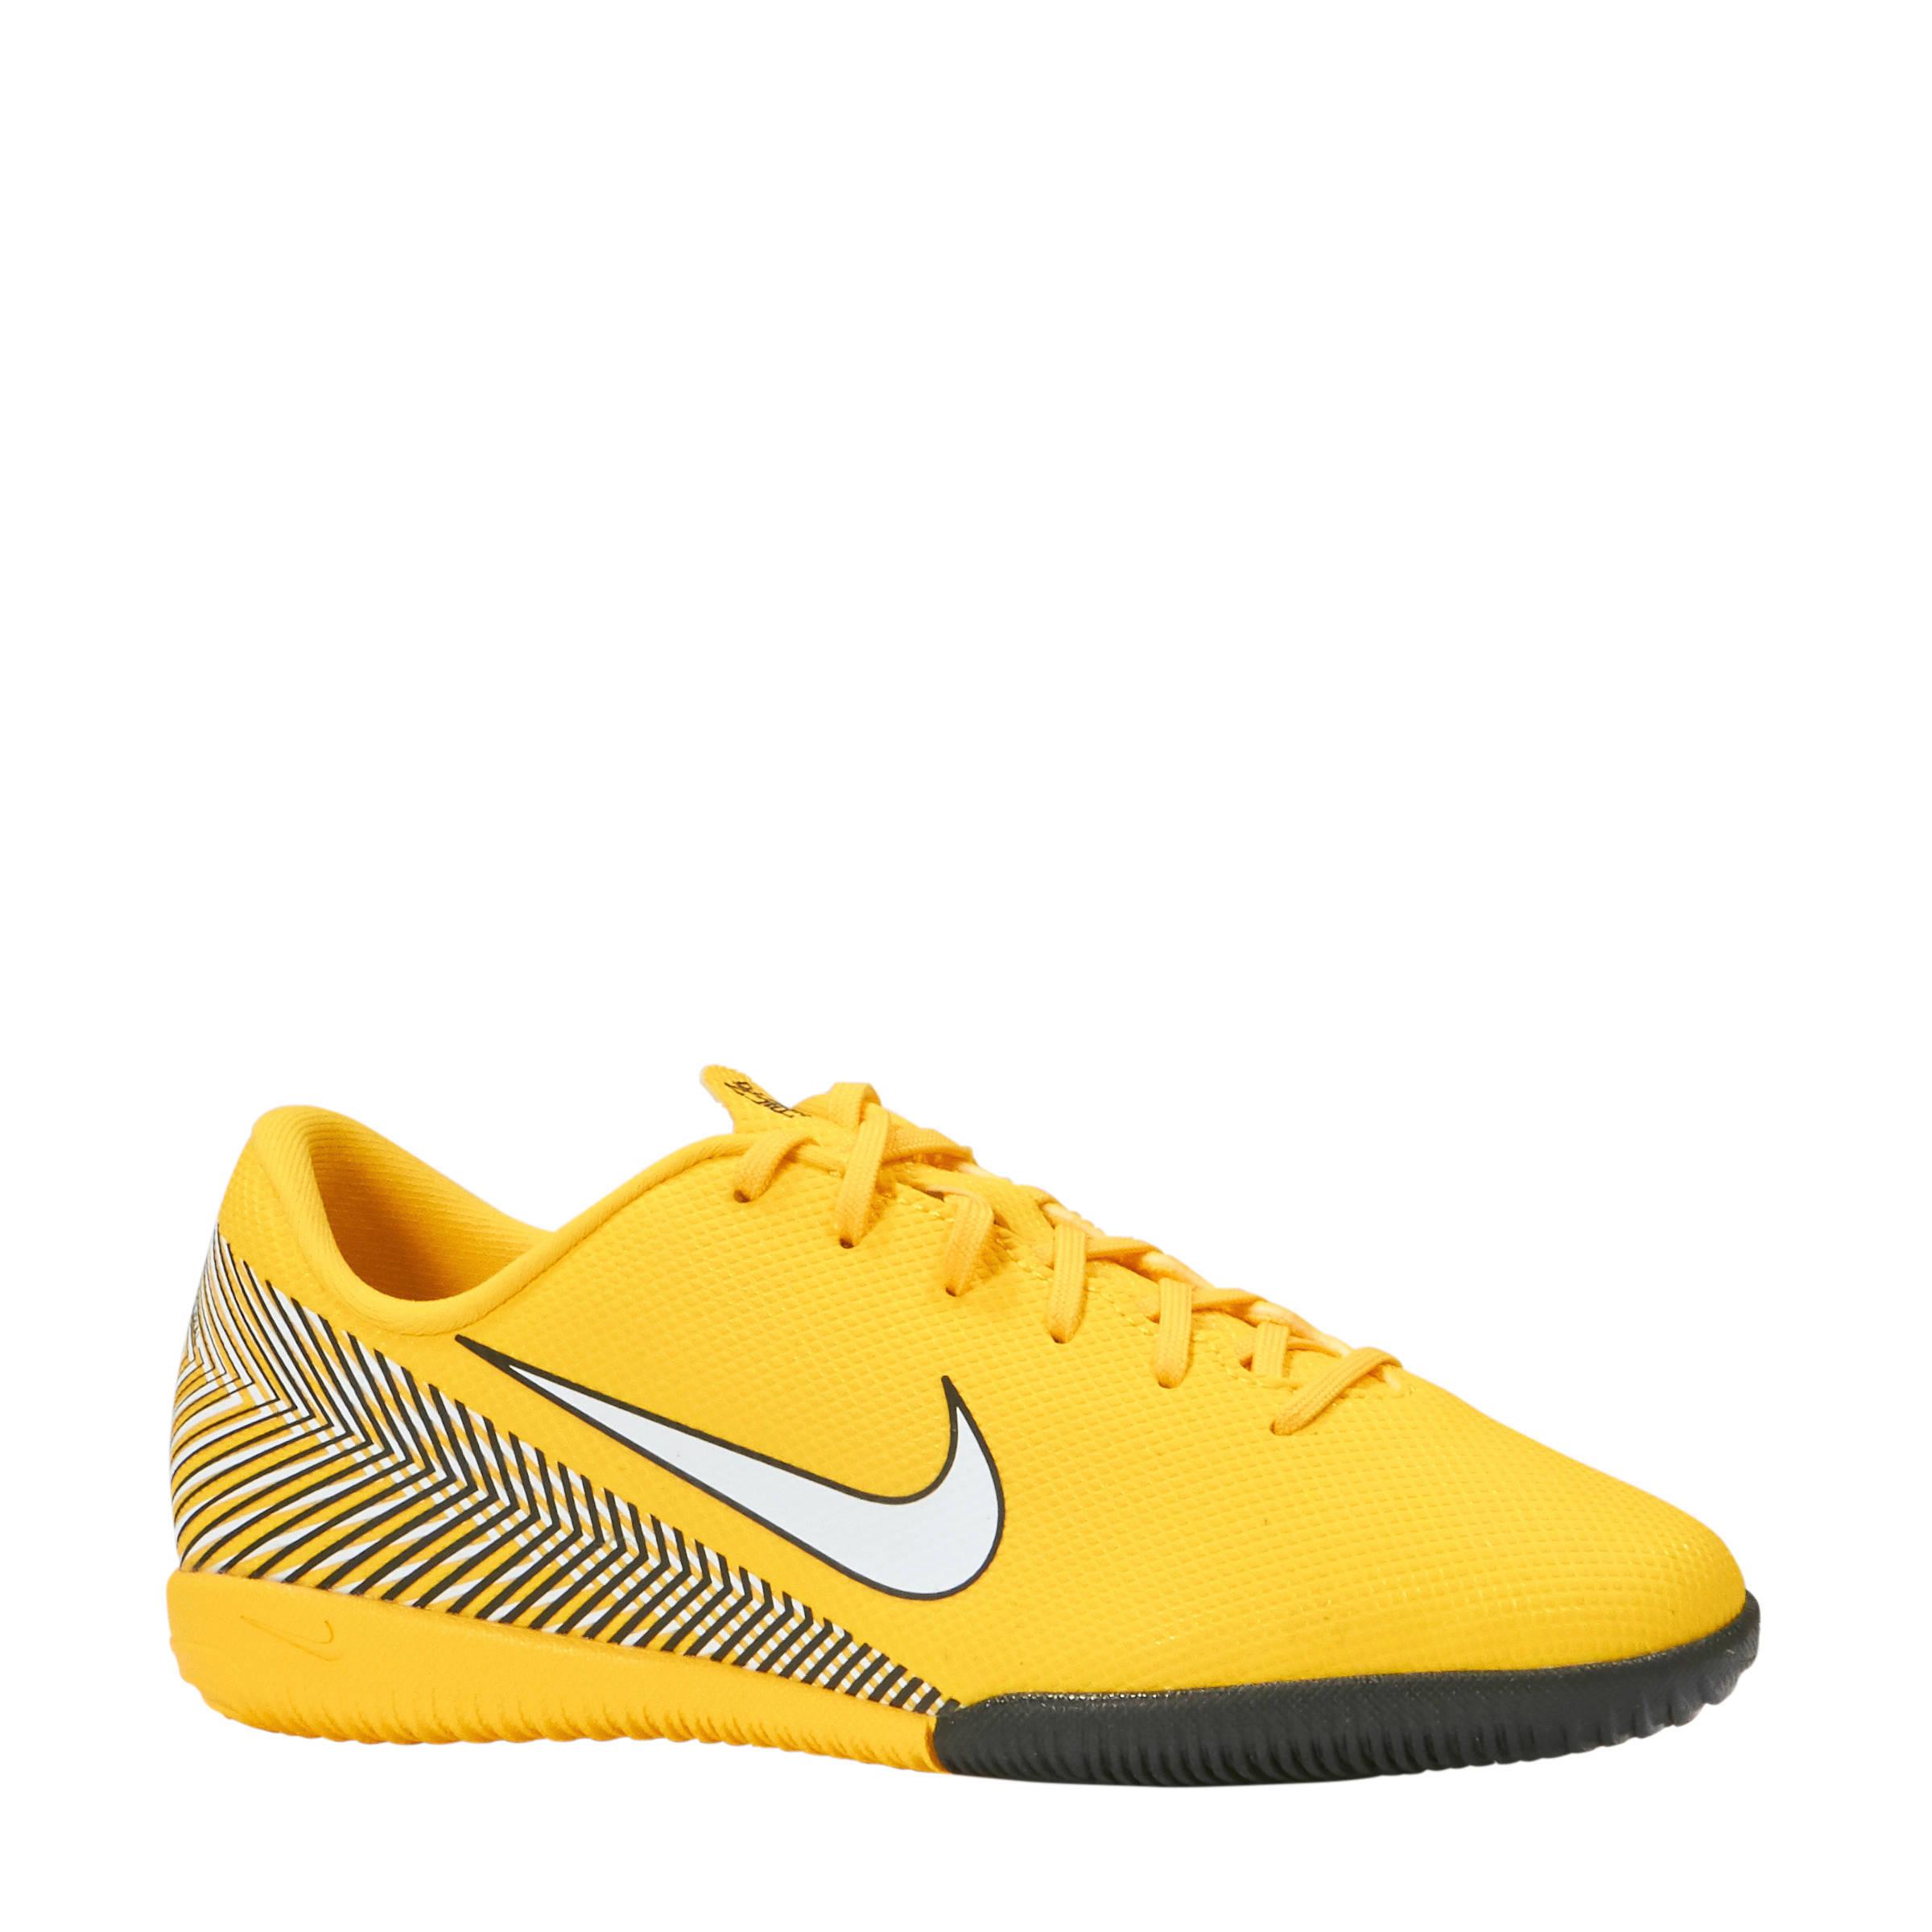 bba2e2ade46 nike-jr-vapor-12-academy-neymar-jr-ic-zaalvoetbalschoenen-geel-geel-0191884292077.jpg